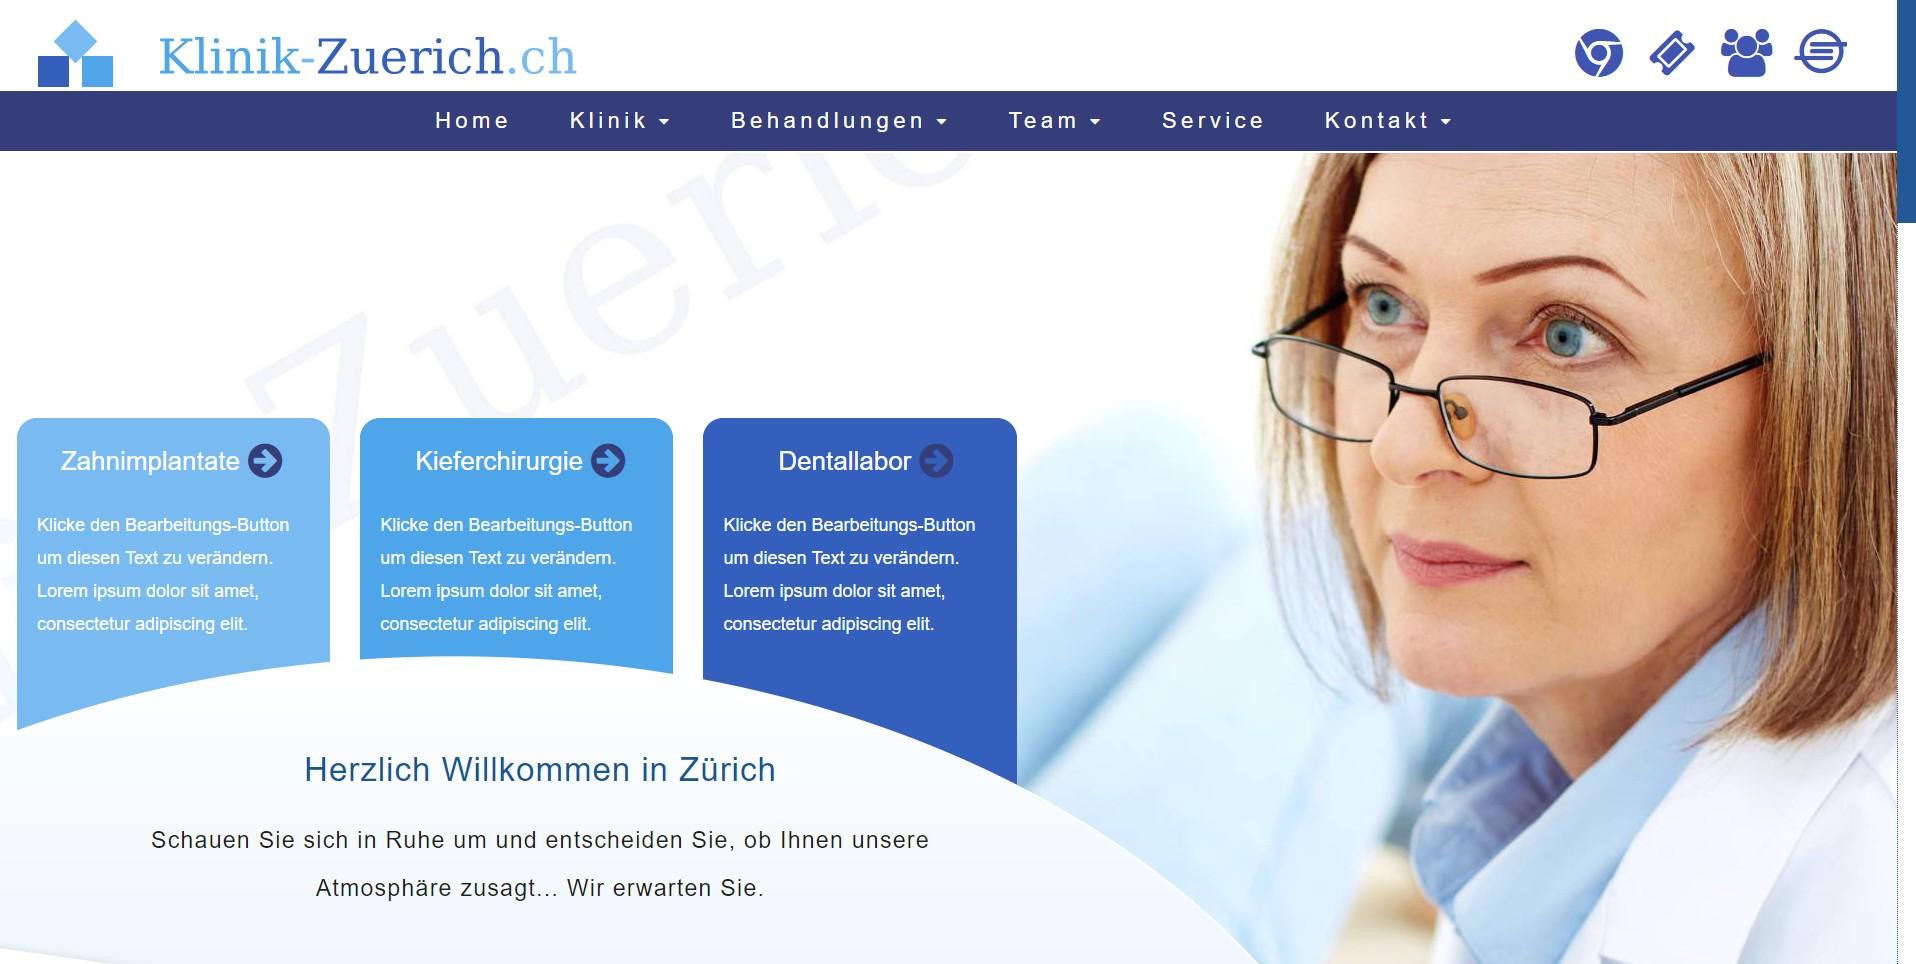 Klinik-Zuerich.ch